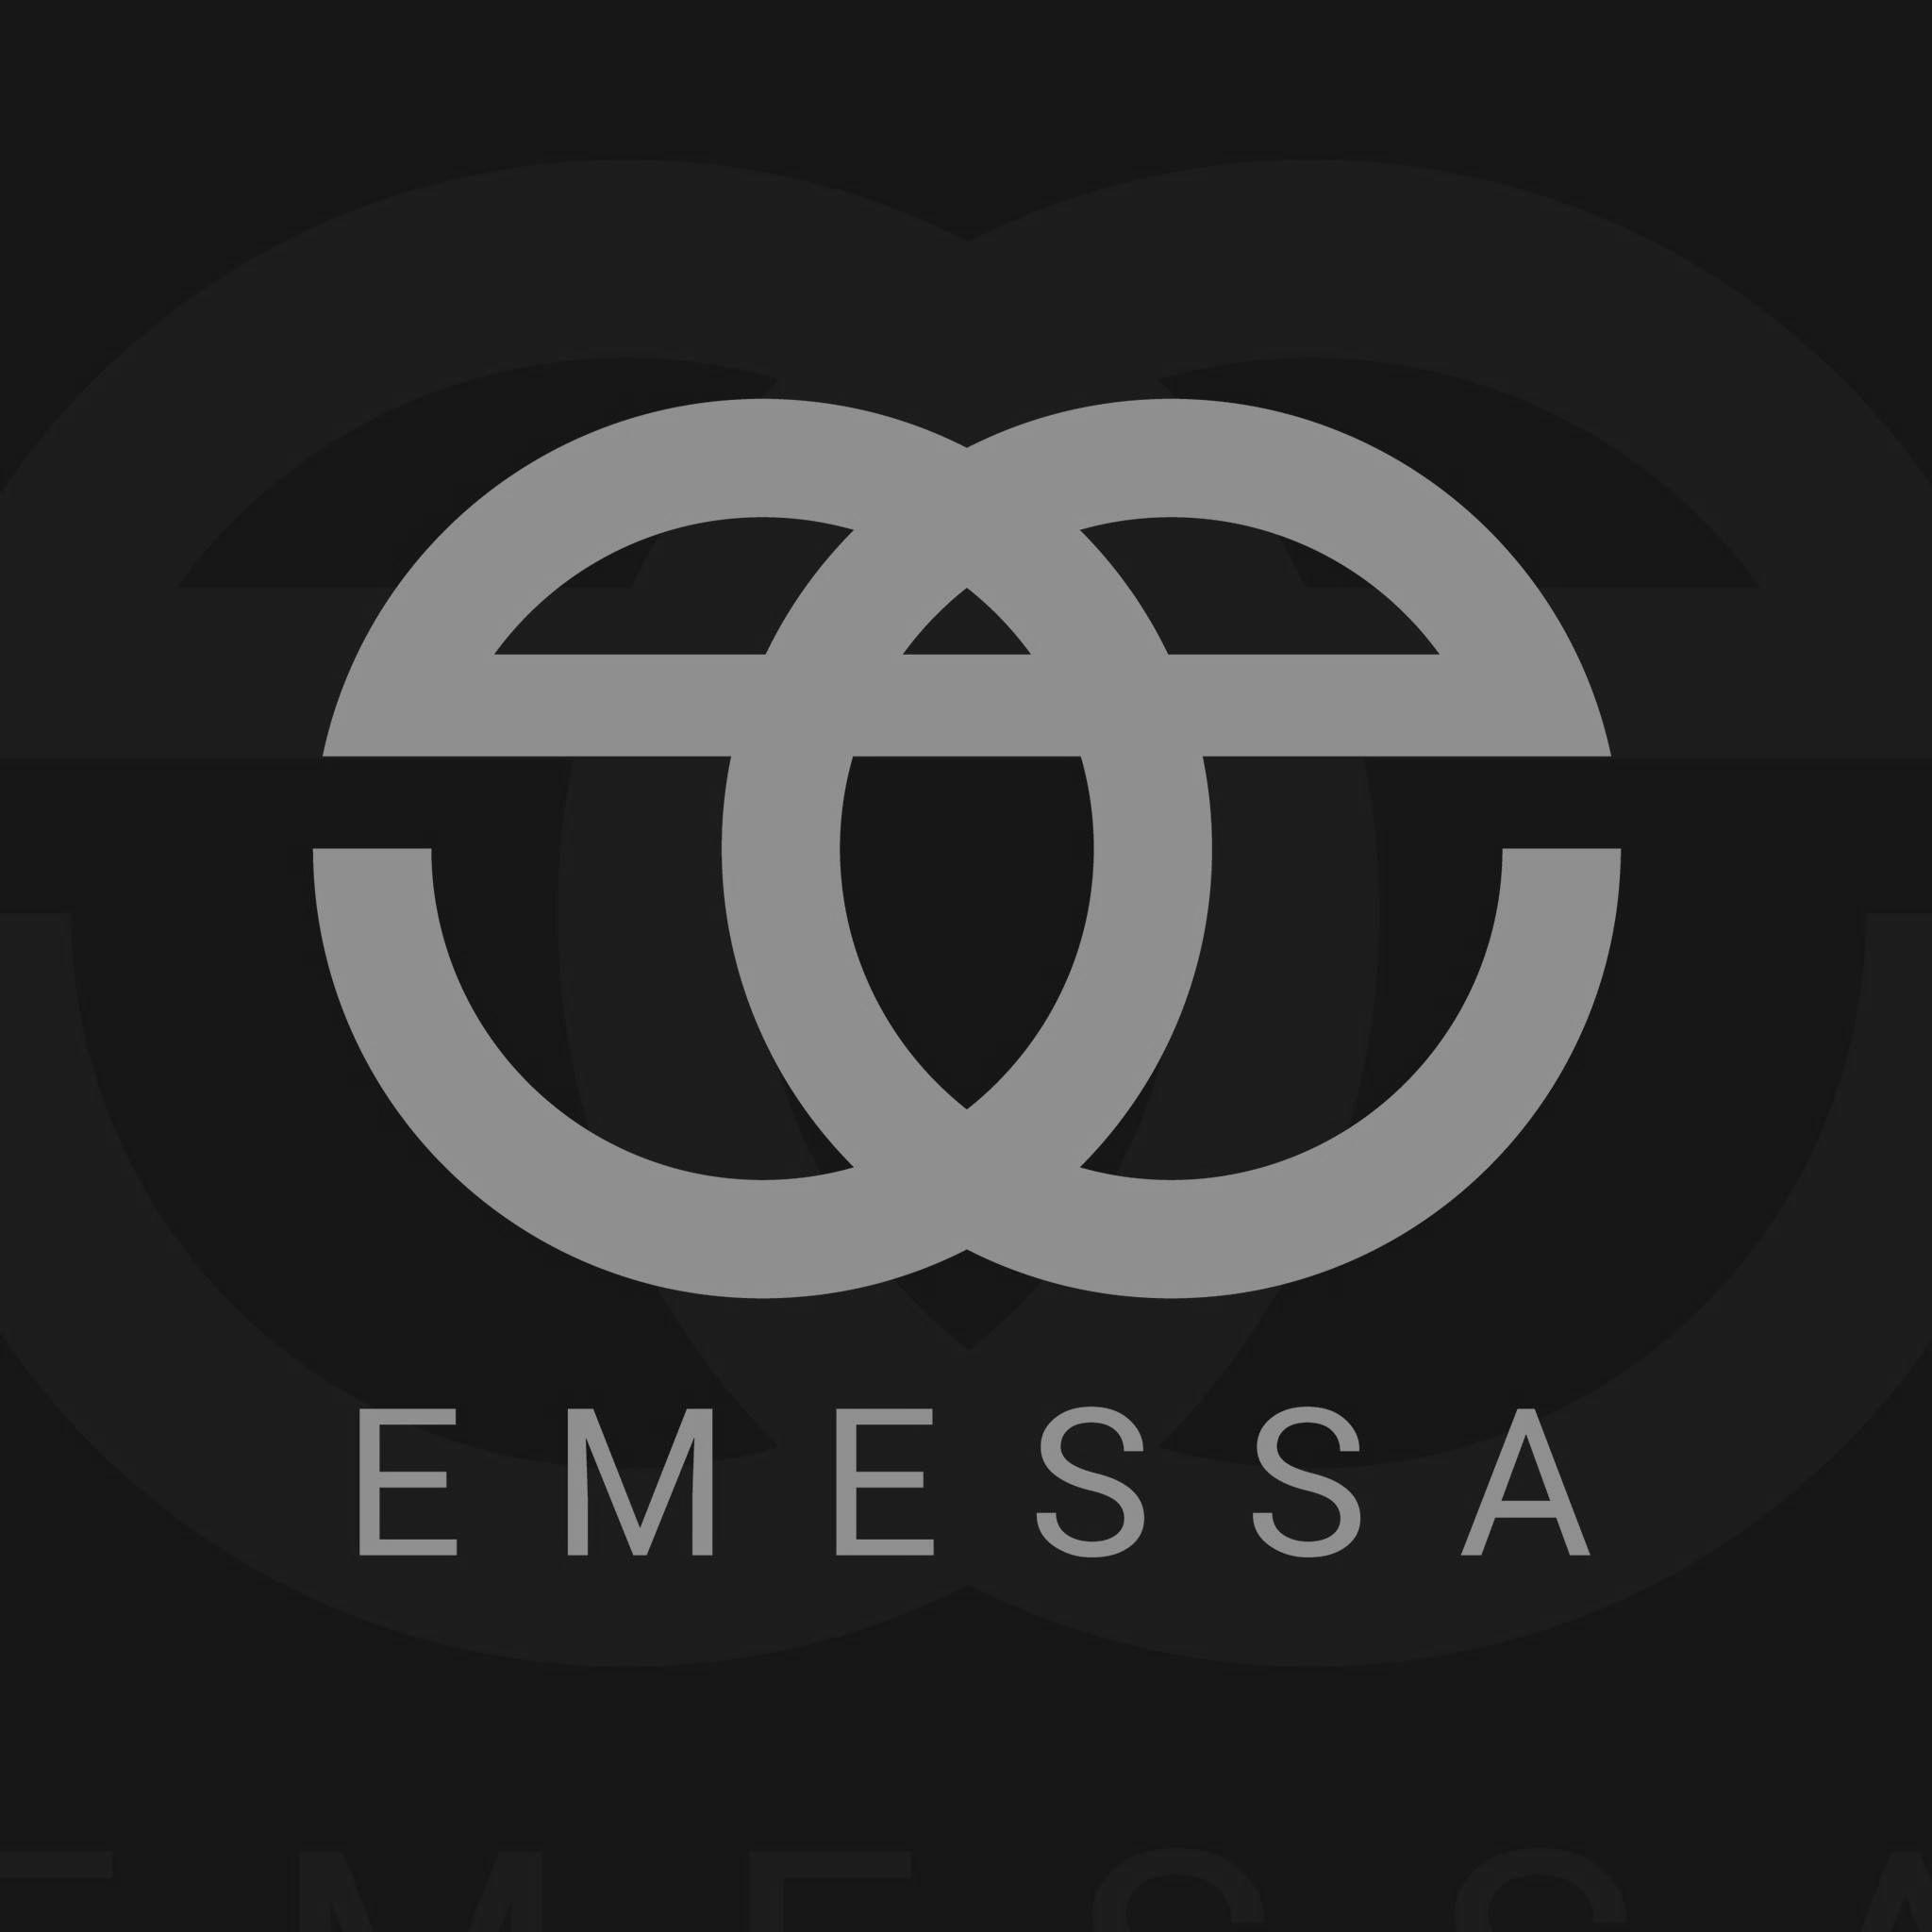 Emessa Jewellery